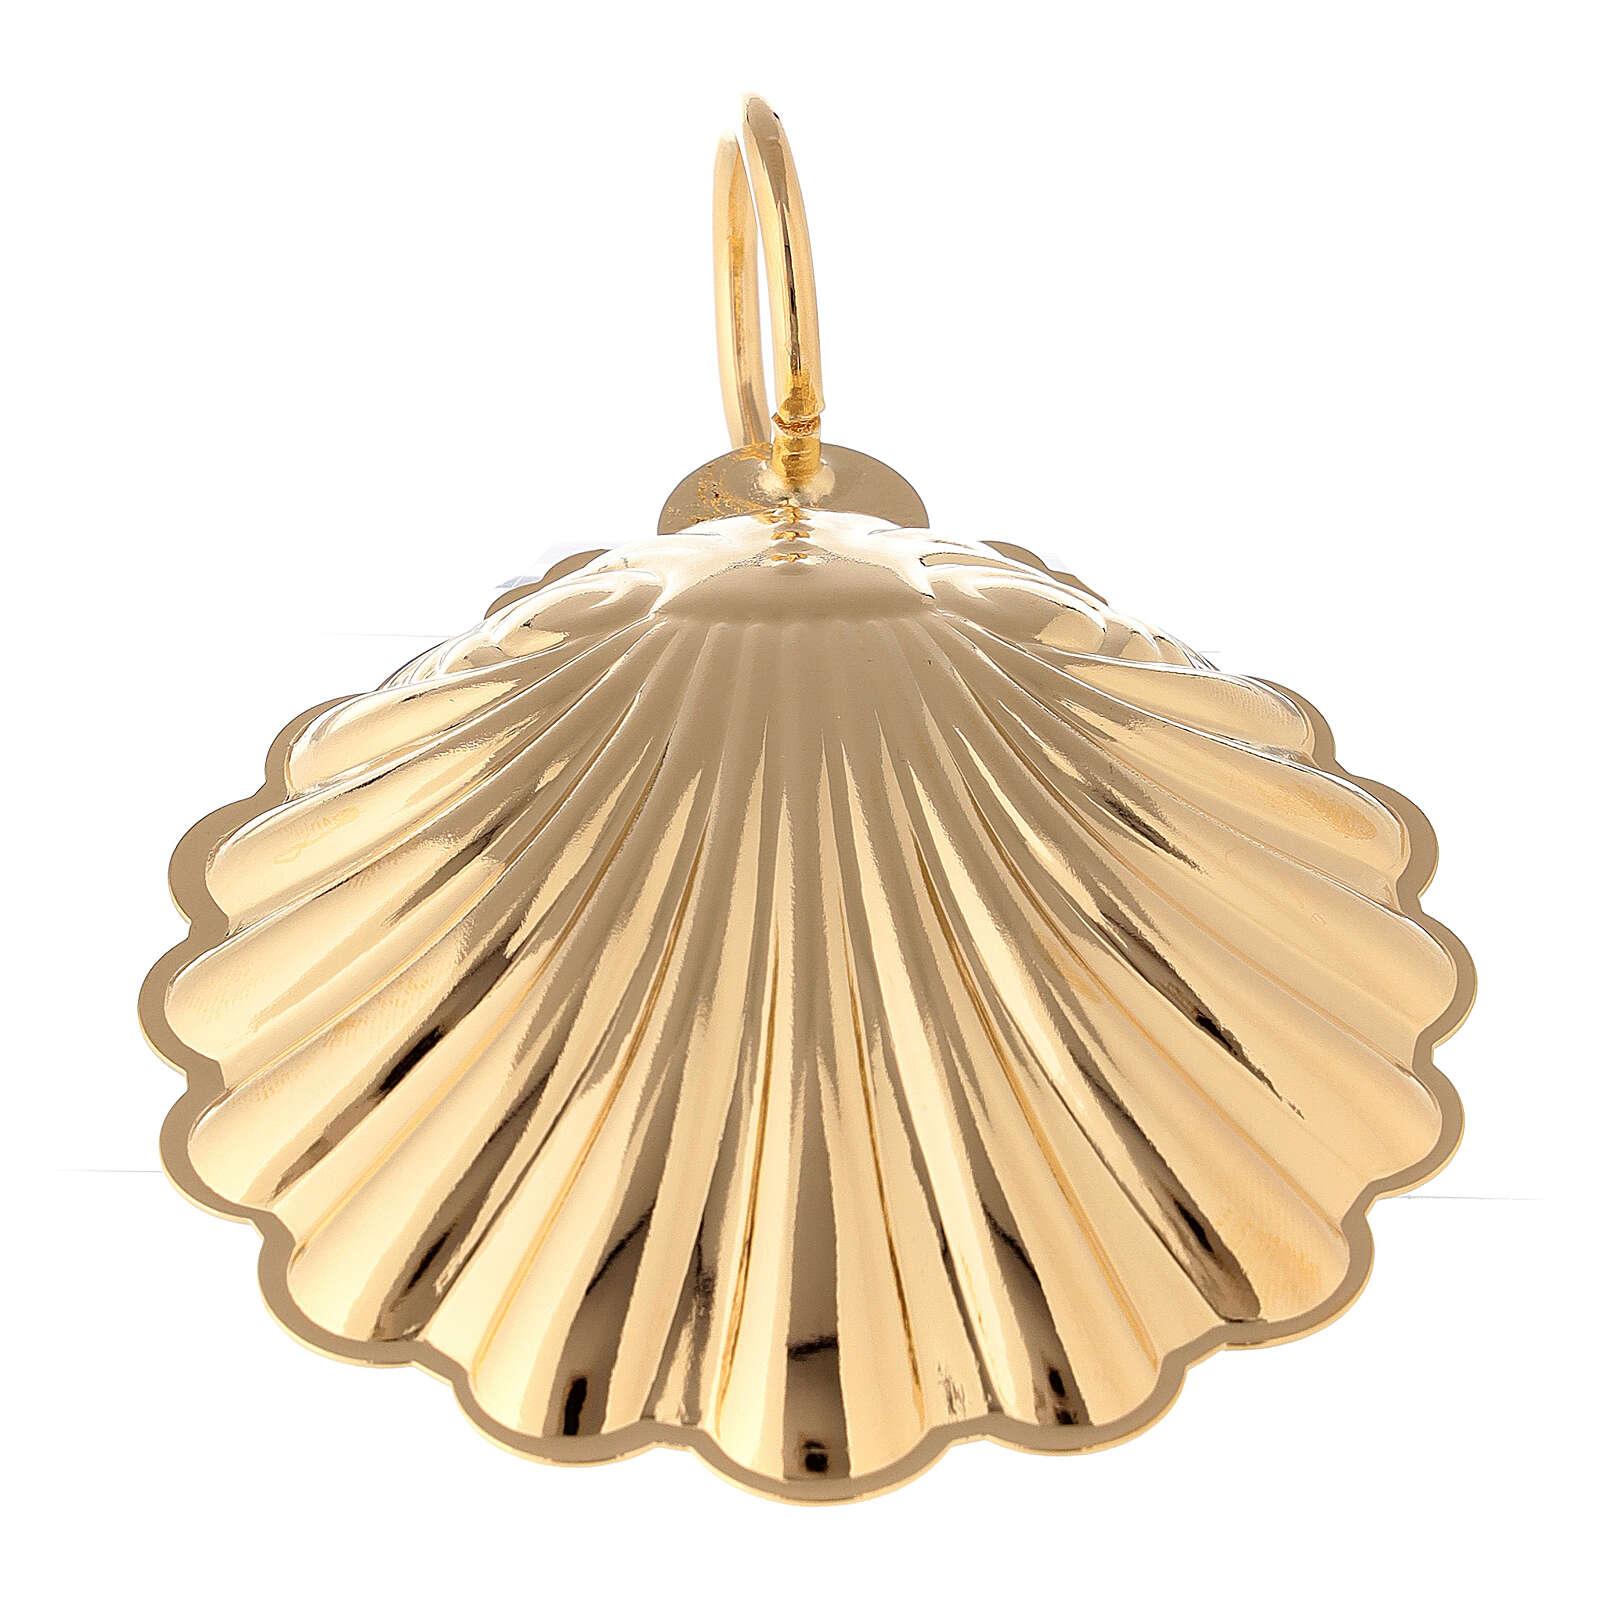 Concha bautismal 9 cm latón dorado 24K 3